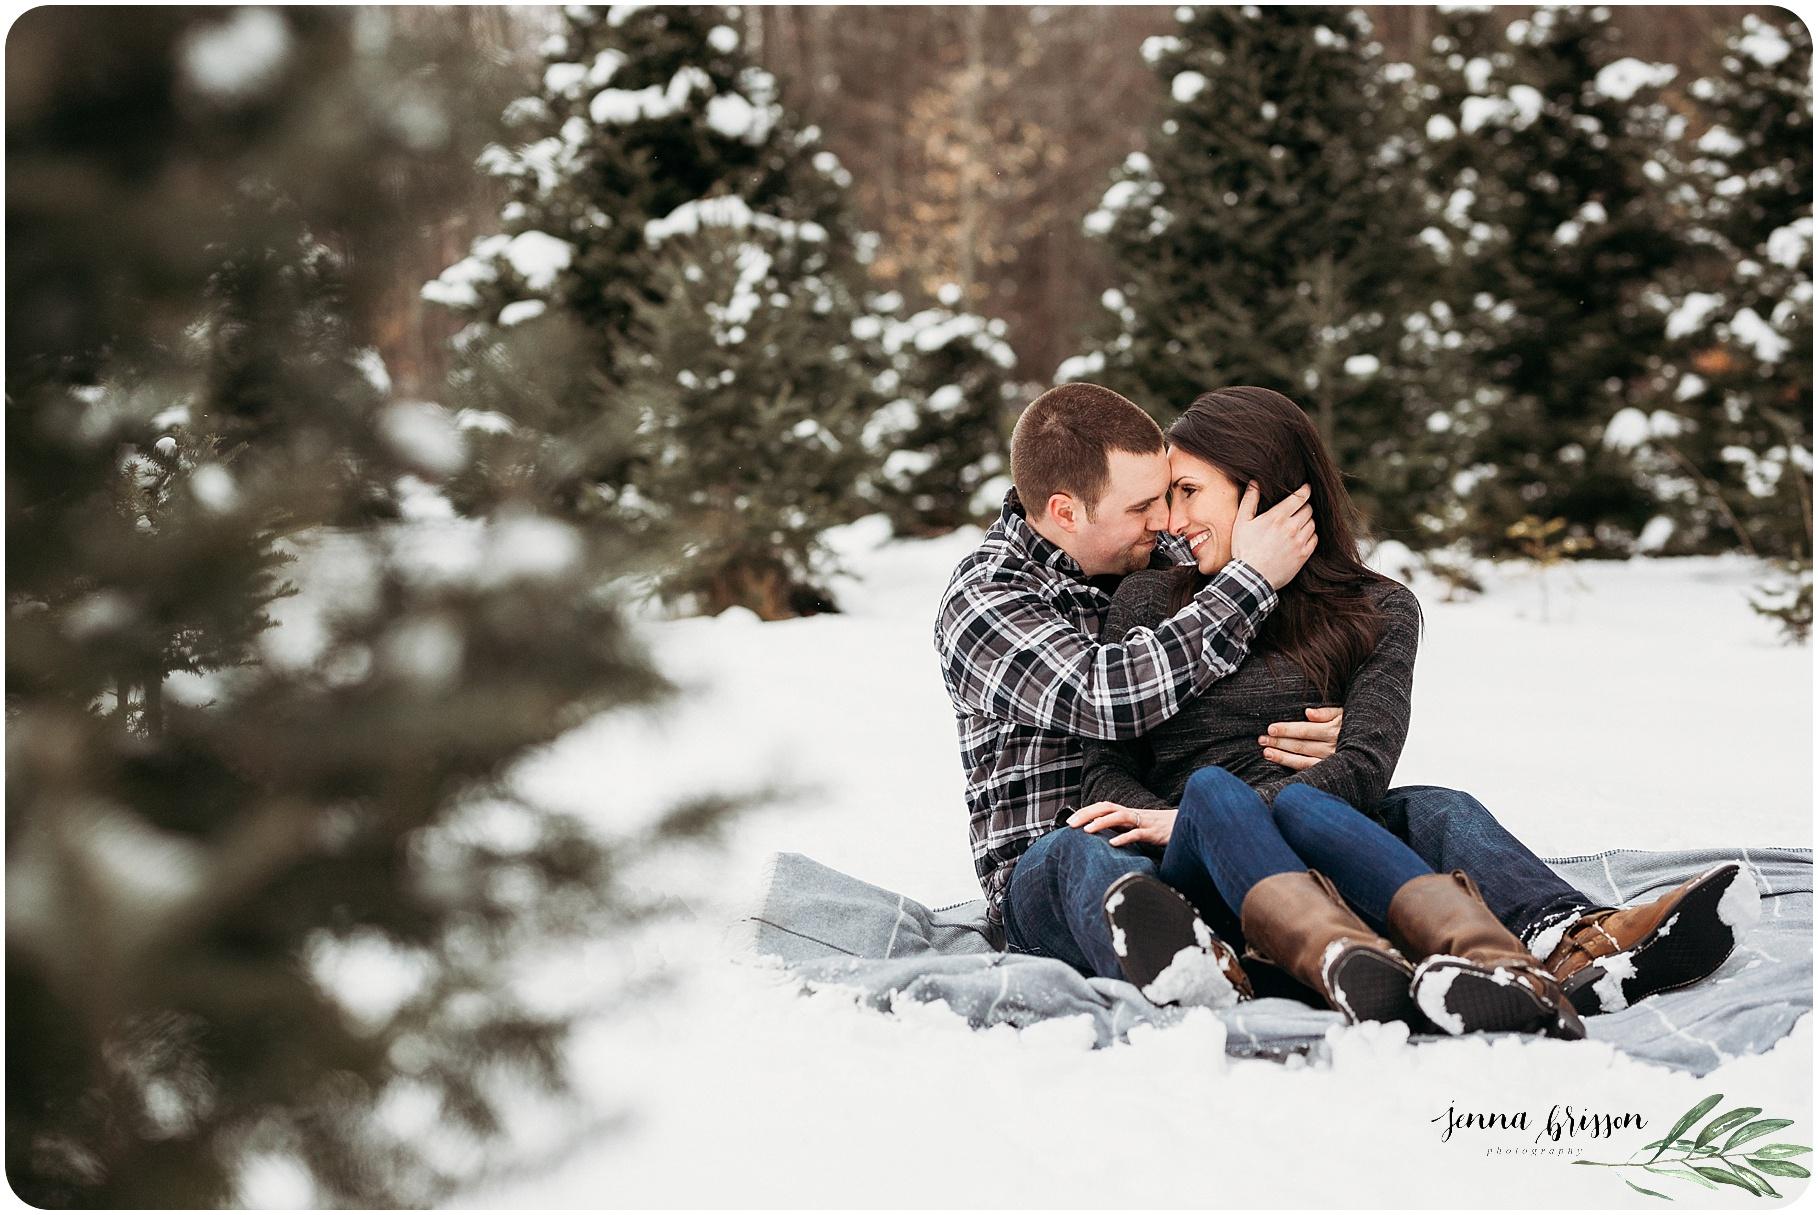 New England Engagement Photos - Jenna Brisson Photography